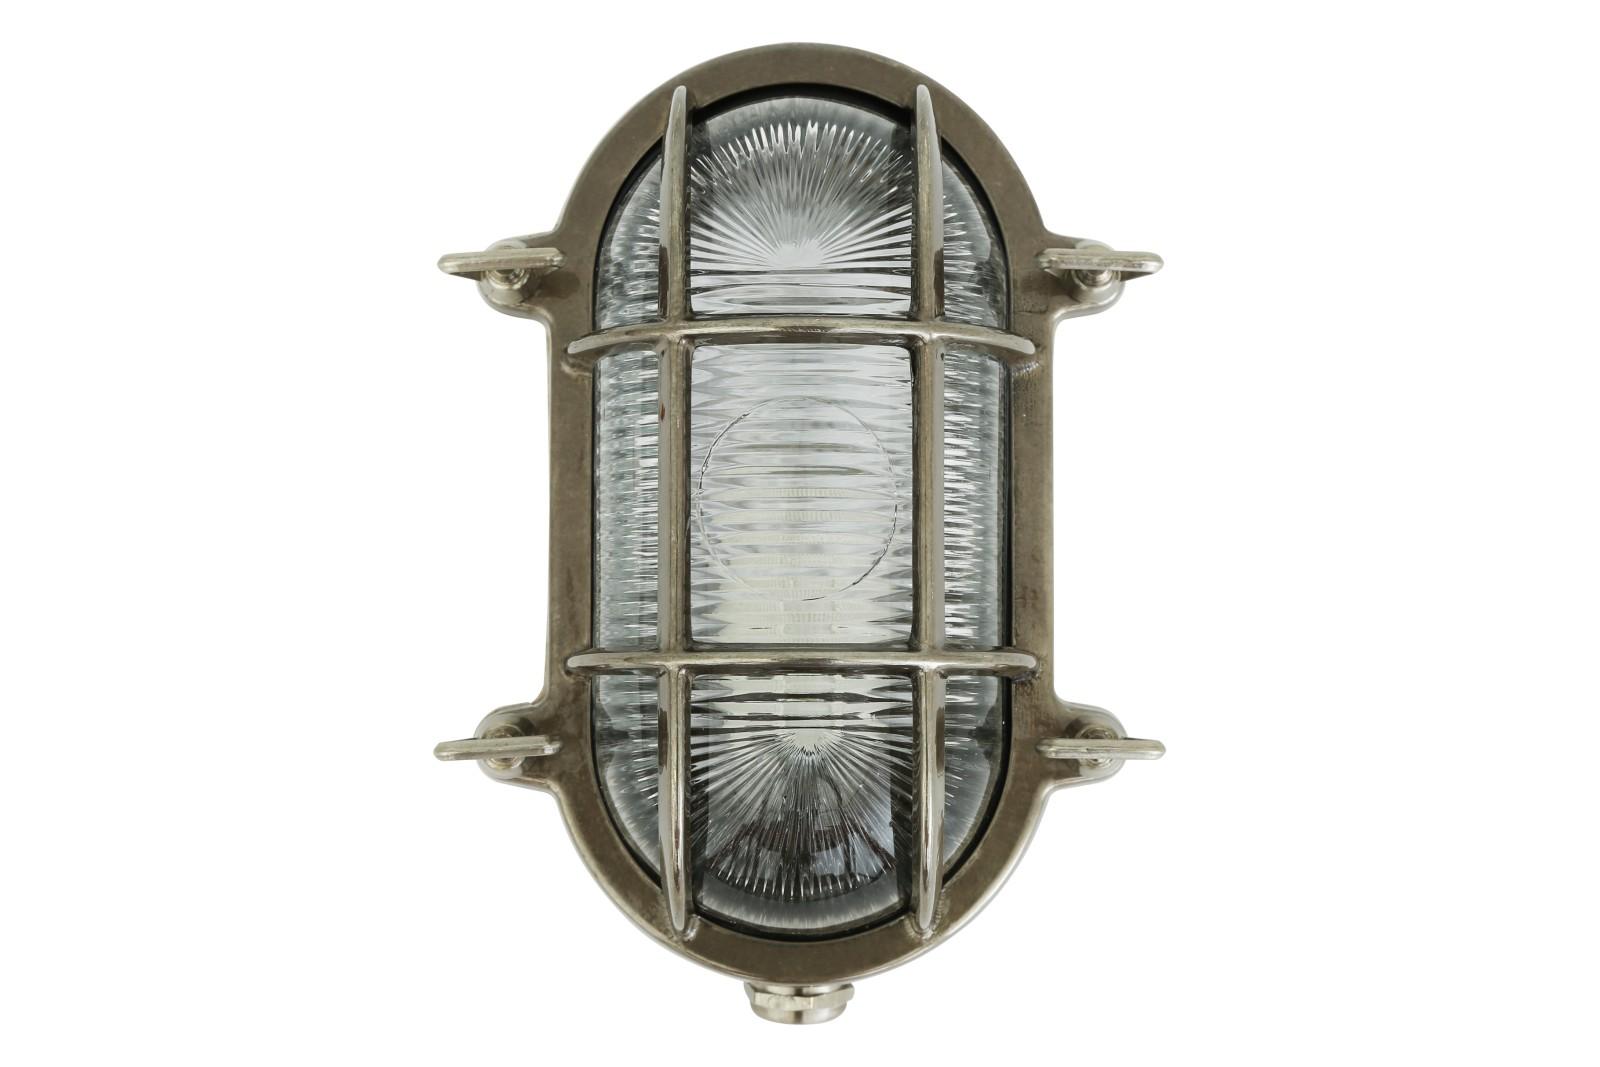 Ruben Small Oval Marine Wall Light Antique Silver